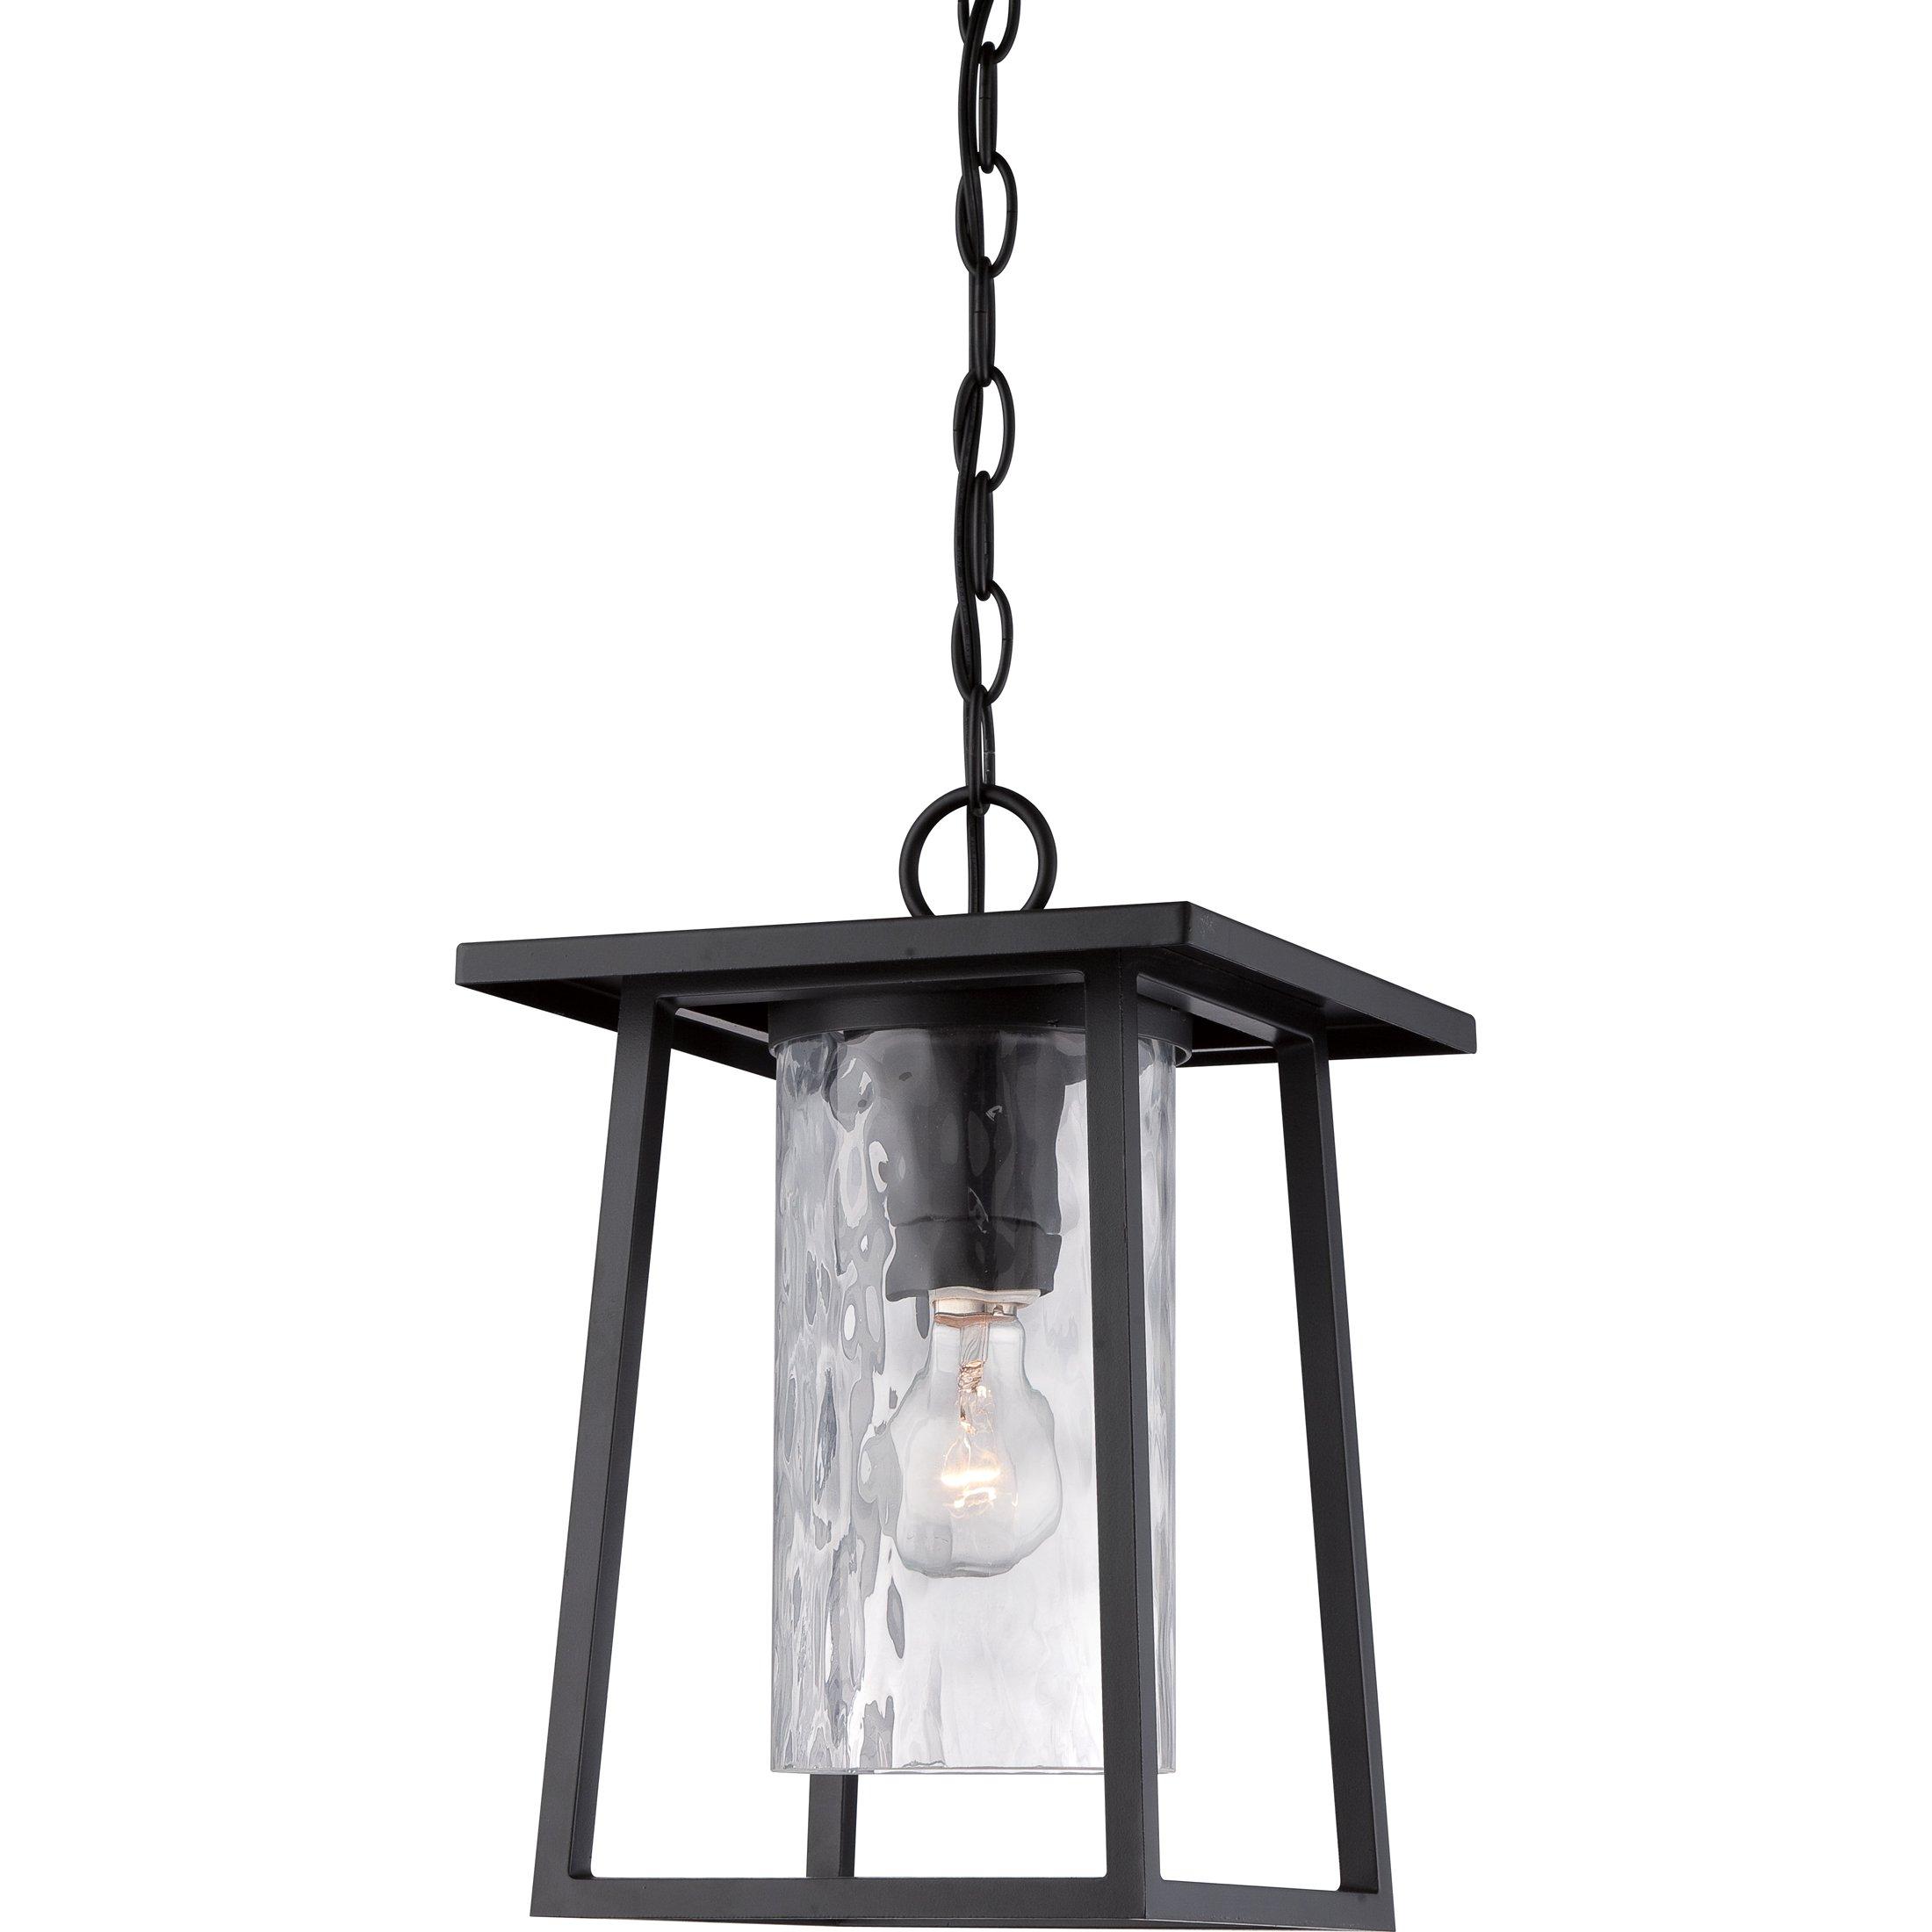 Quoizel LDG1909K 1-Light Lodge Outdoor Lantern in Mystic Black by Quoizel